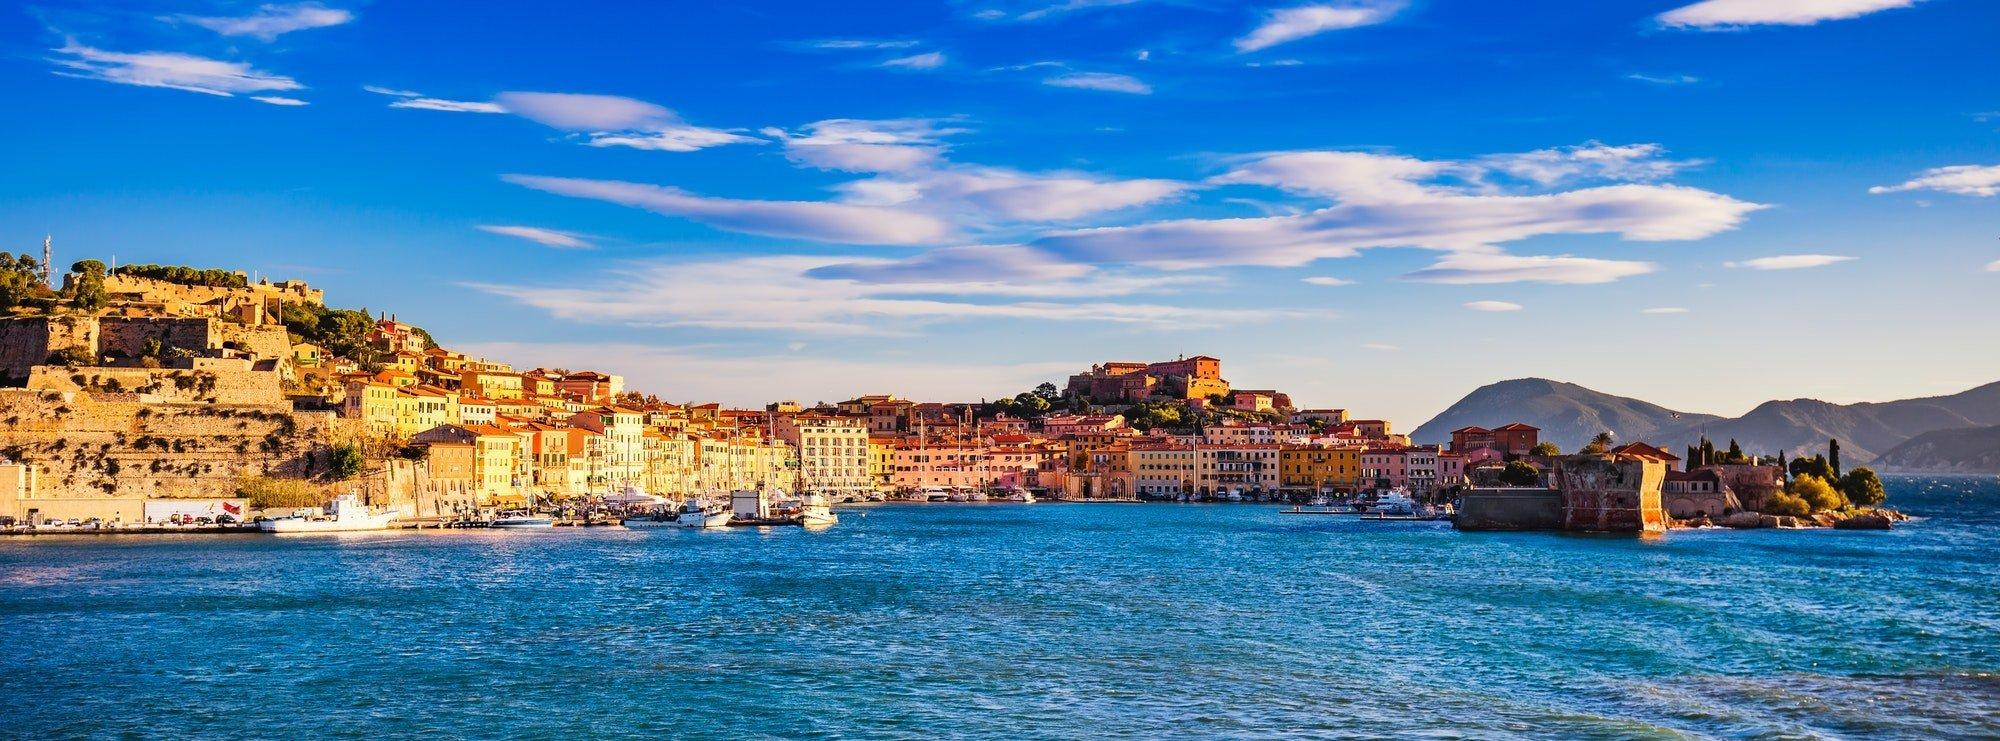 Elba island, Portoferraio village panorama, harbour and skyline.